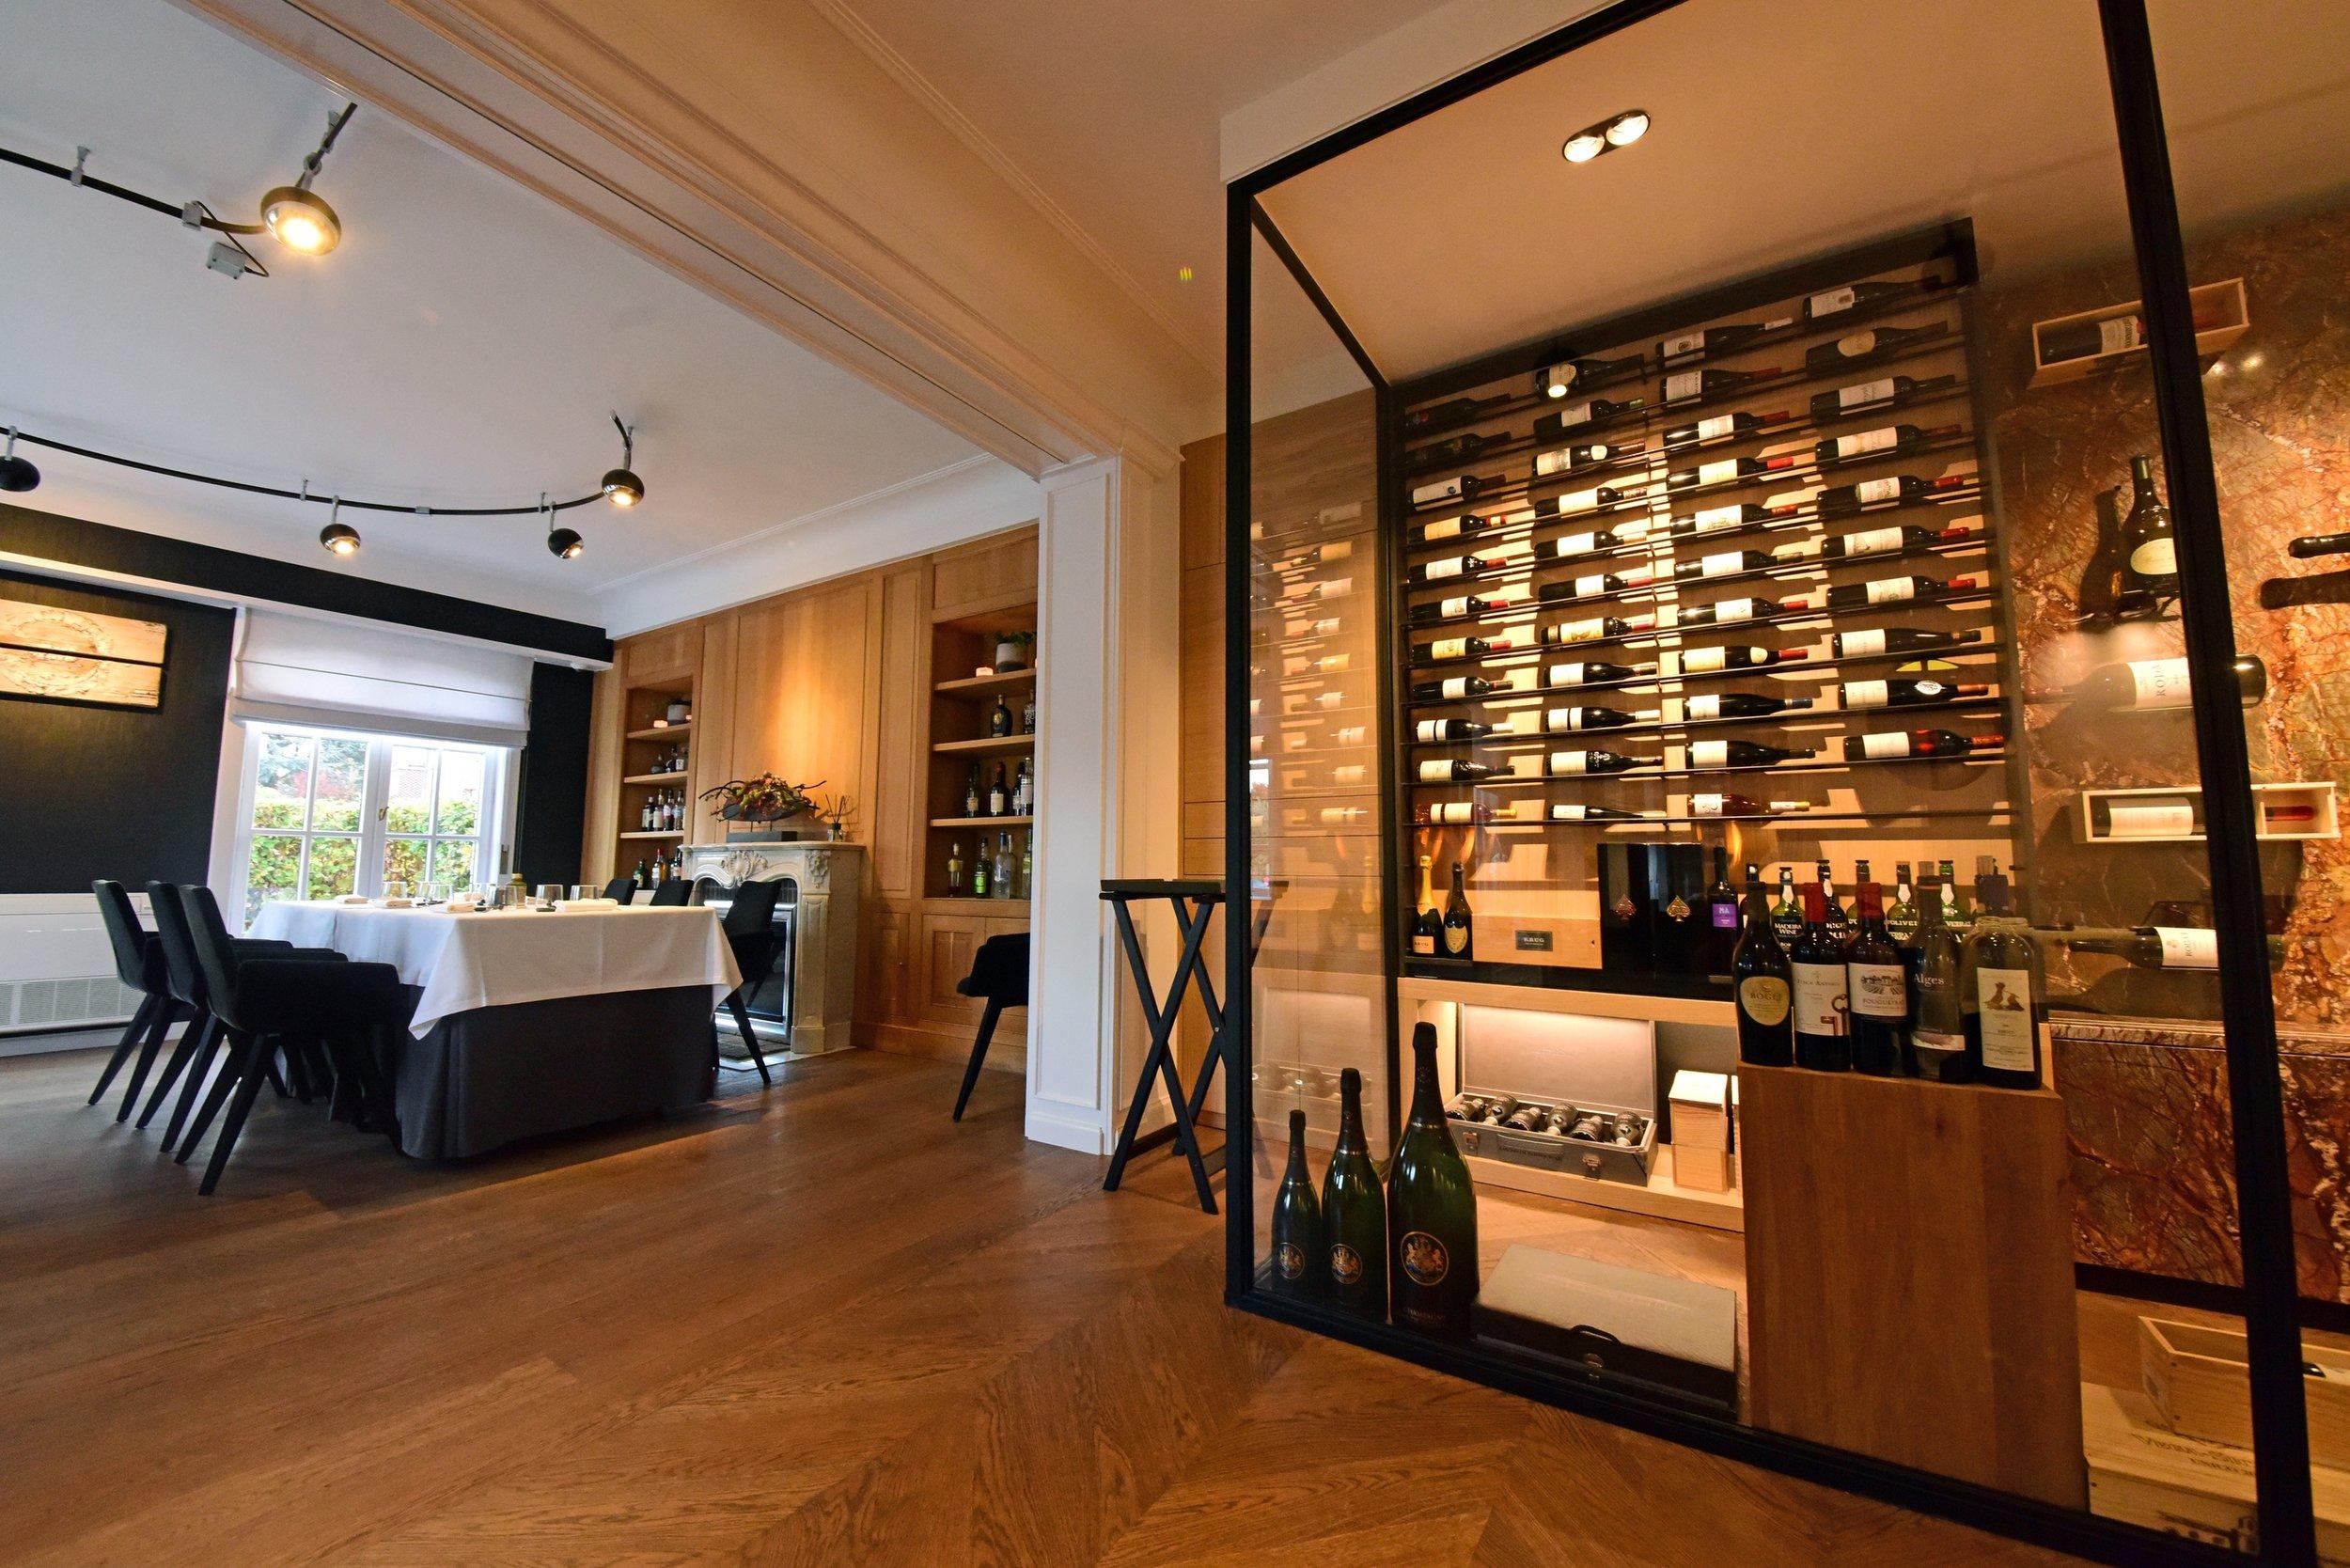 26 restaurant de bakermat ninove tablefever bart albrecht culinair fotograaf.jpg